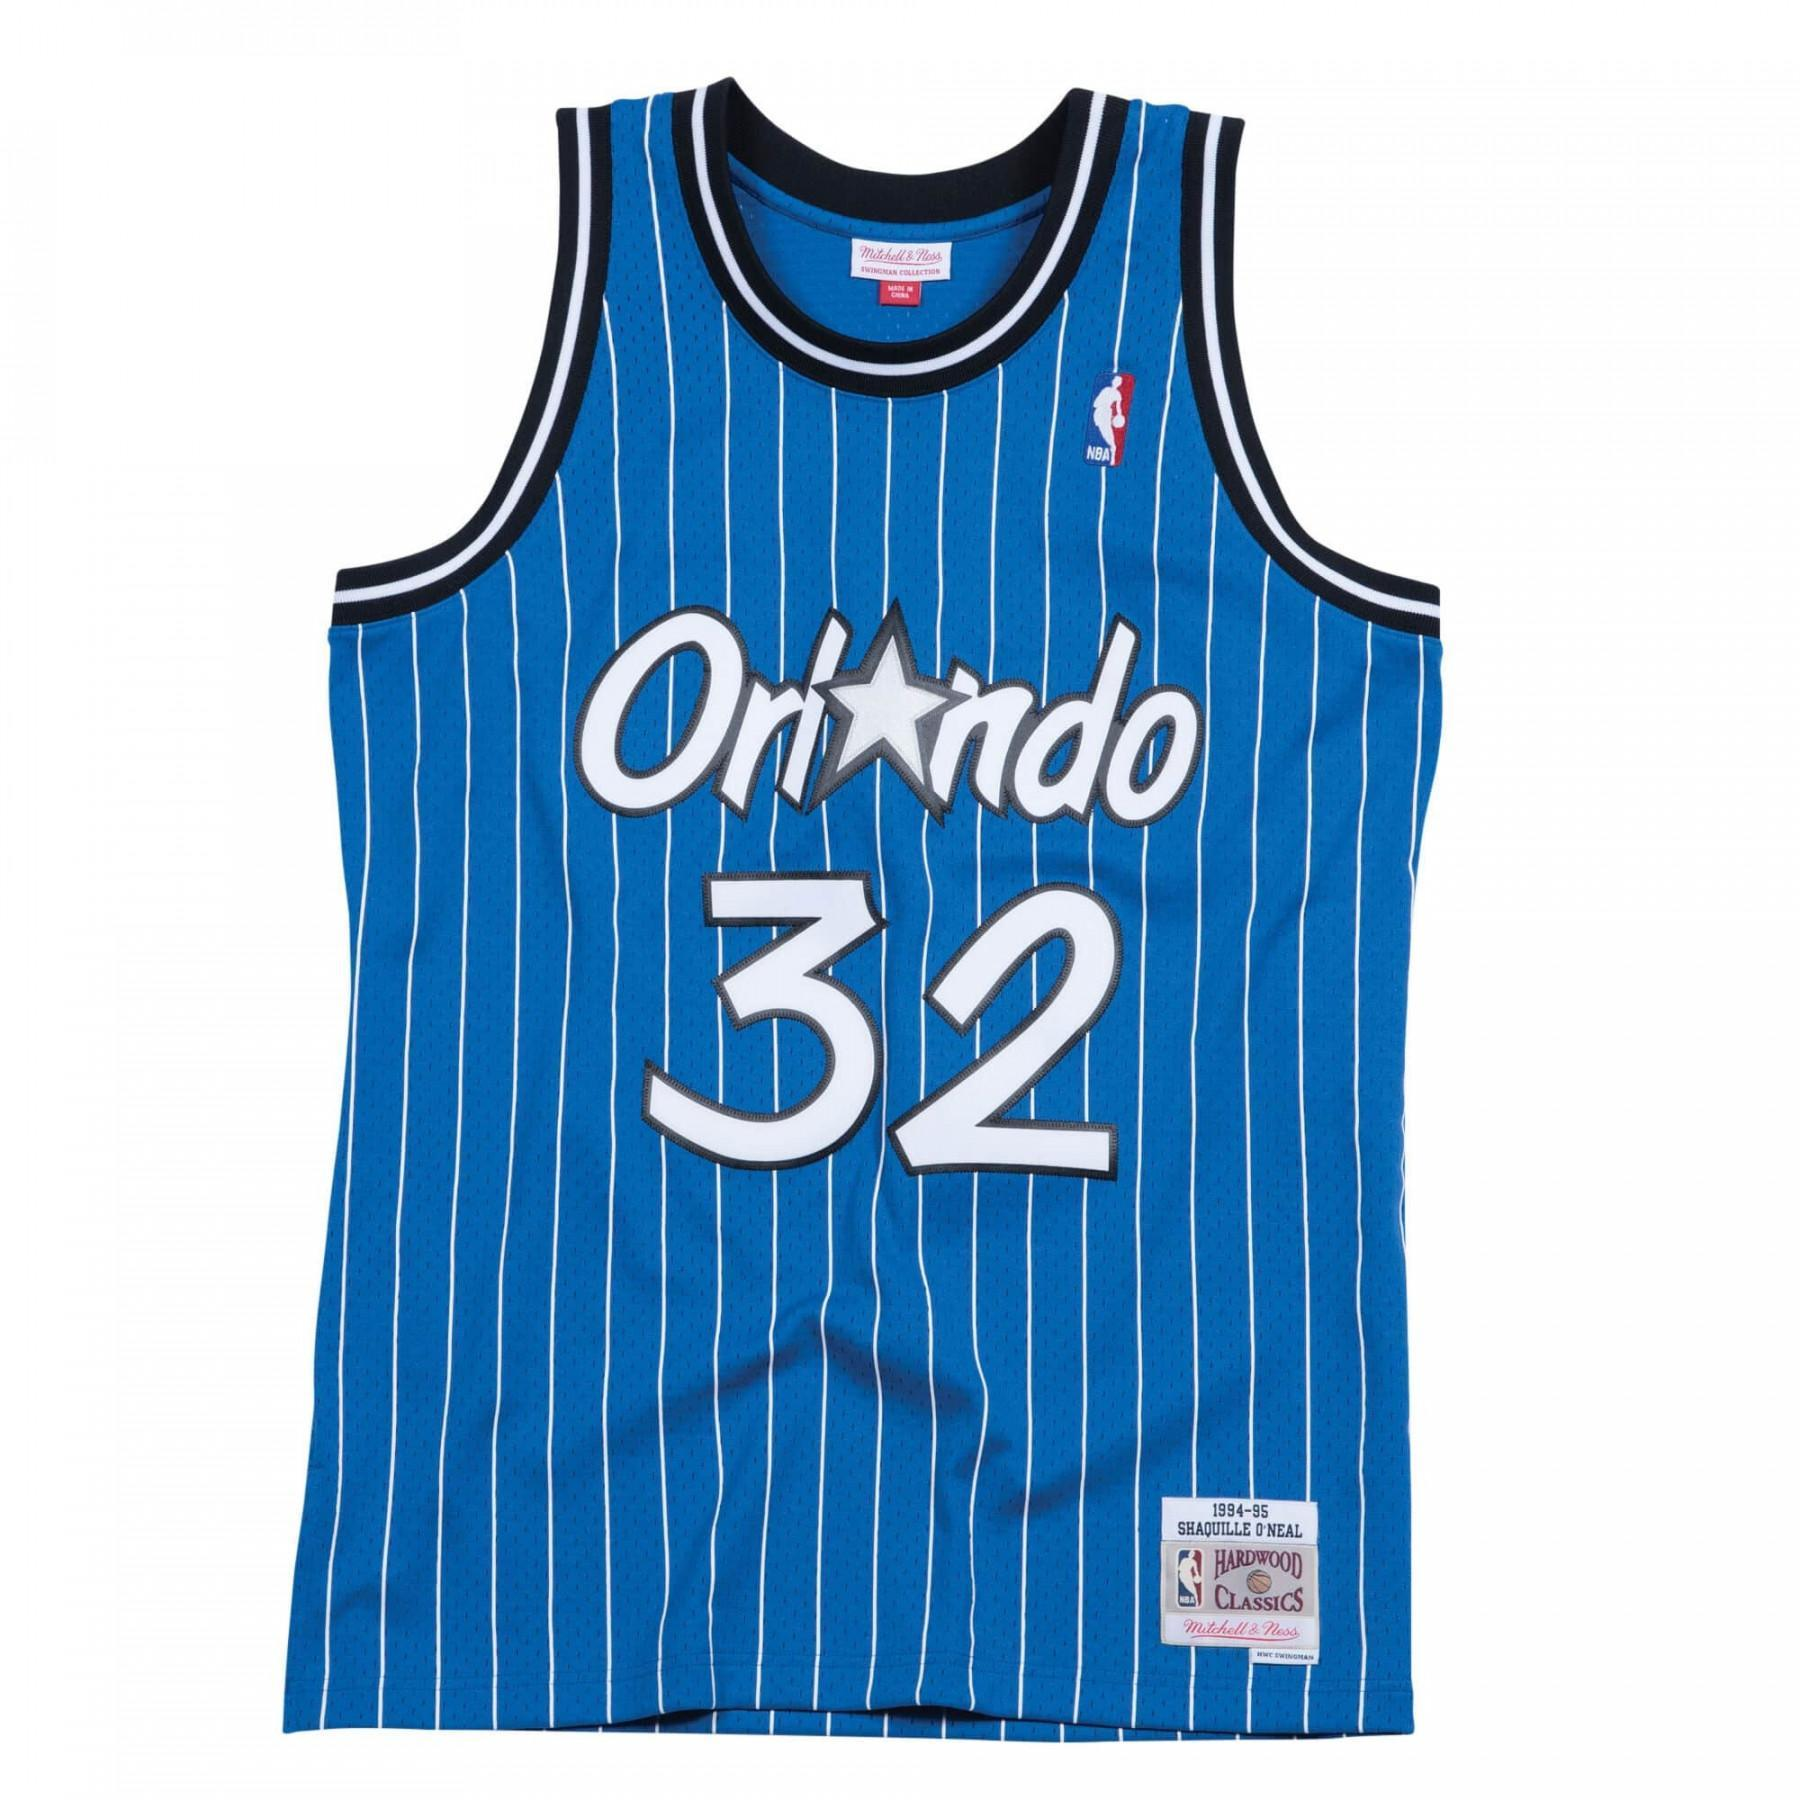 Orlando magic swingman jersey julius erving #6